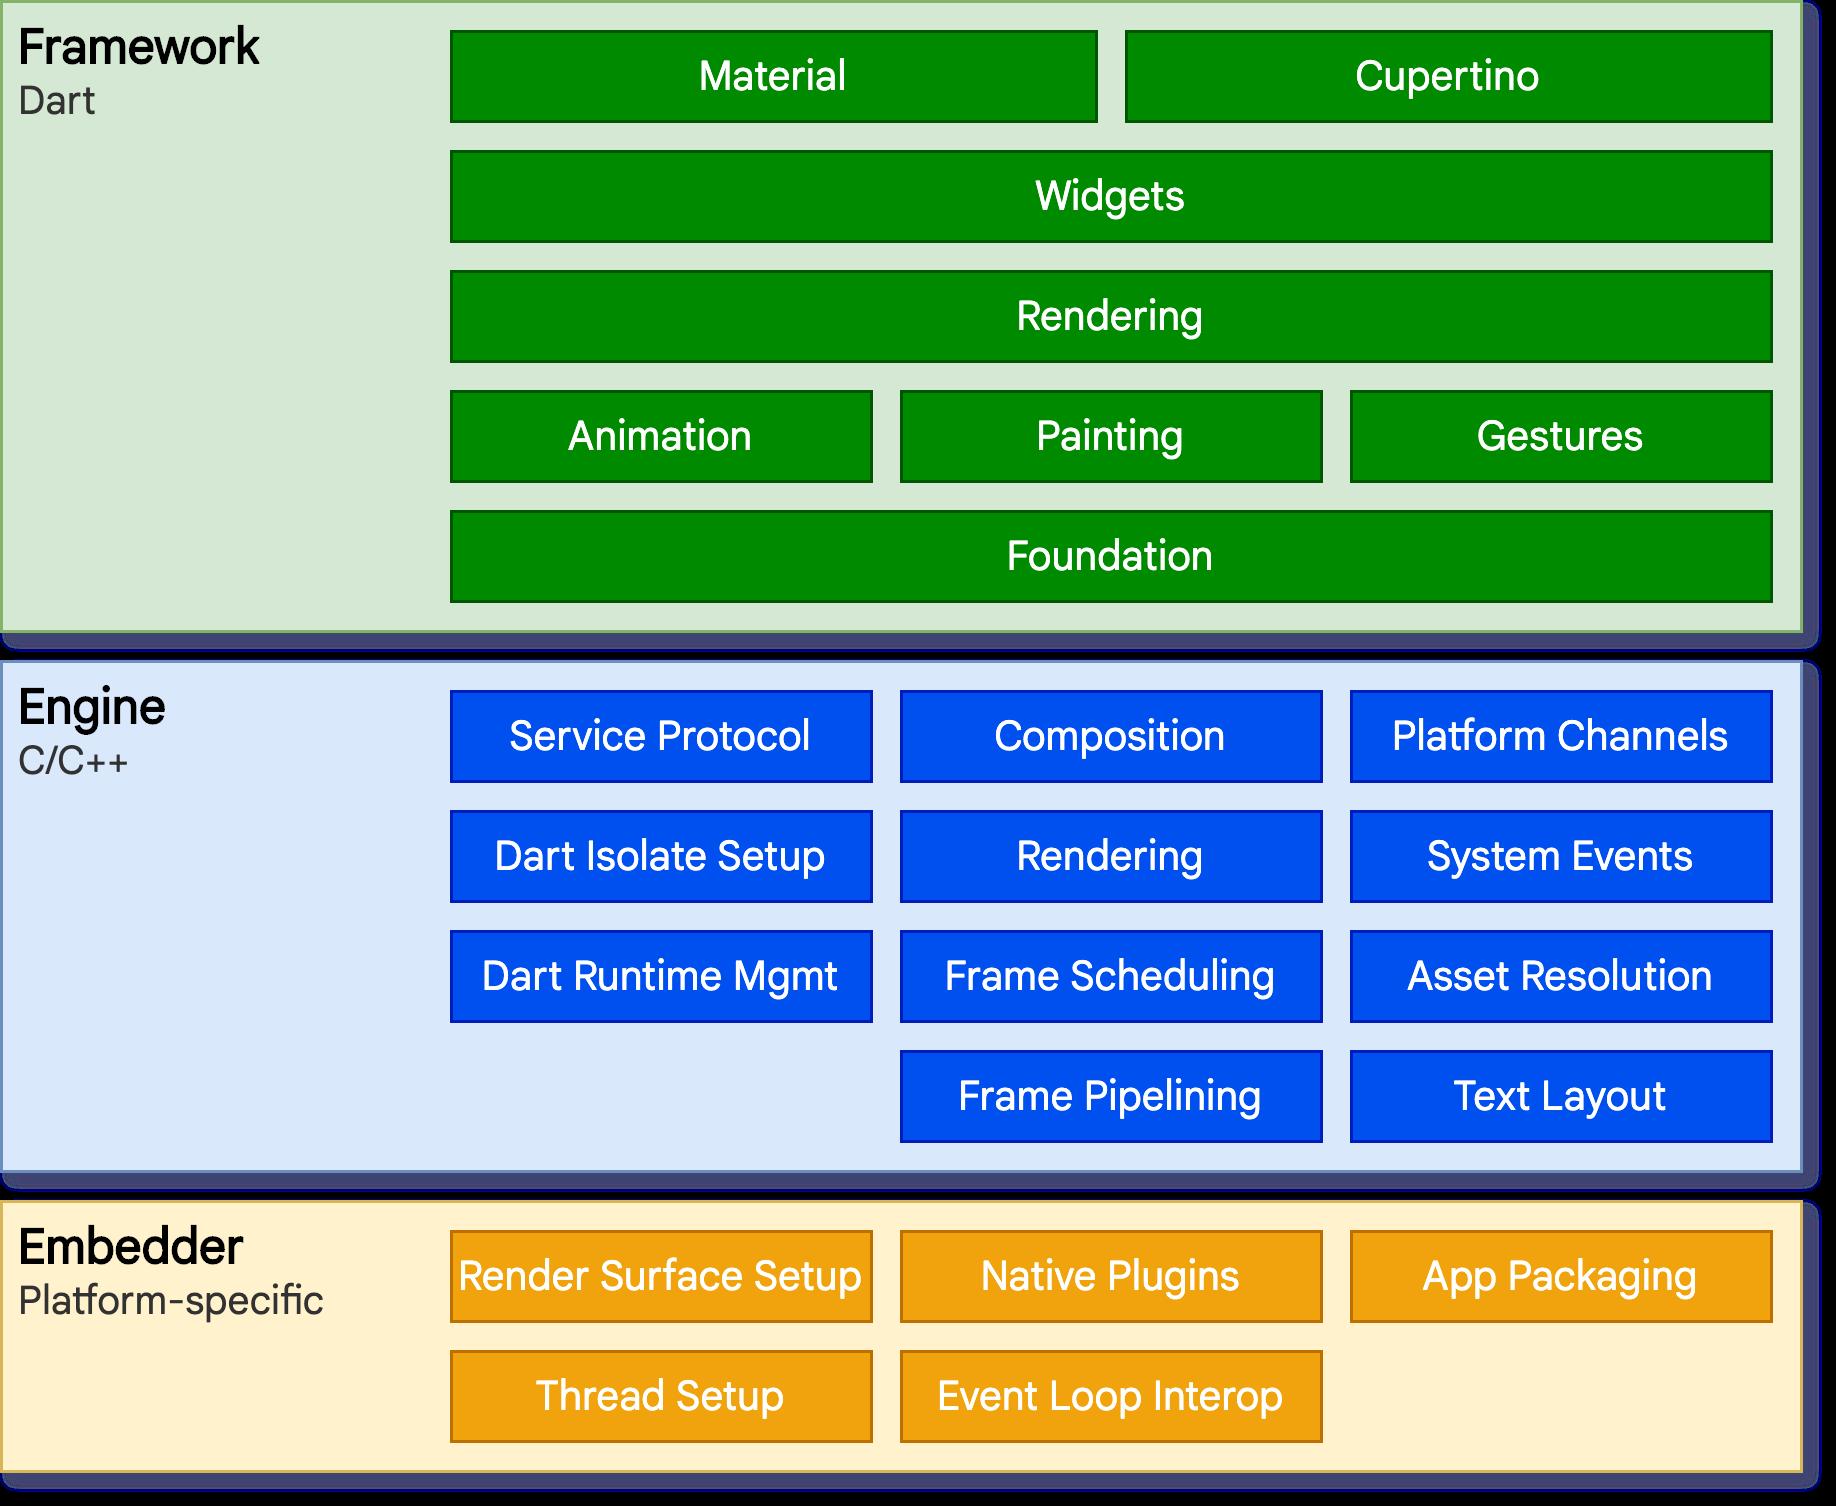 A diagram showing the framework for Flutter utilizing Dart and C/C++.